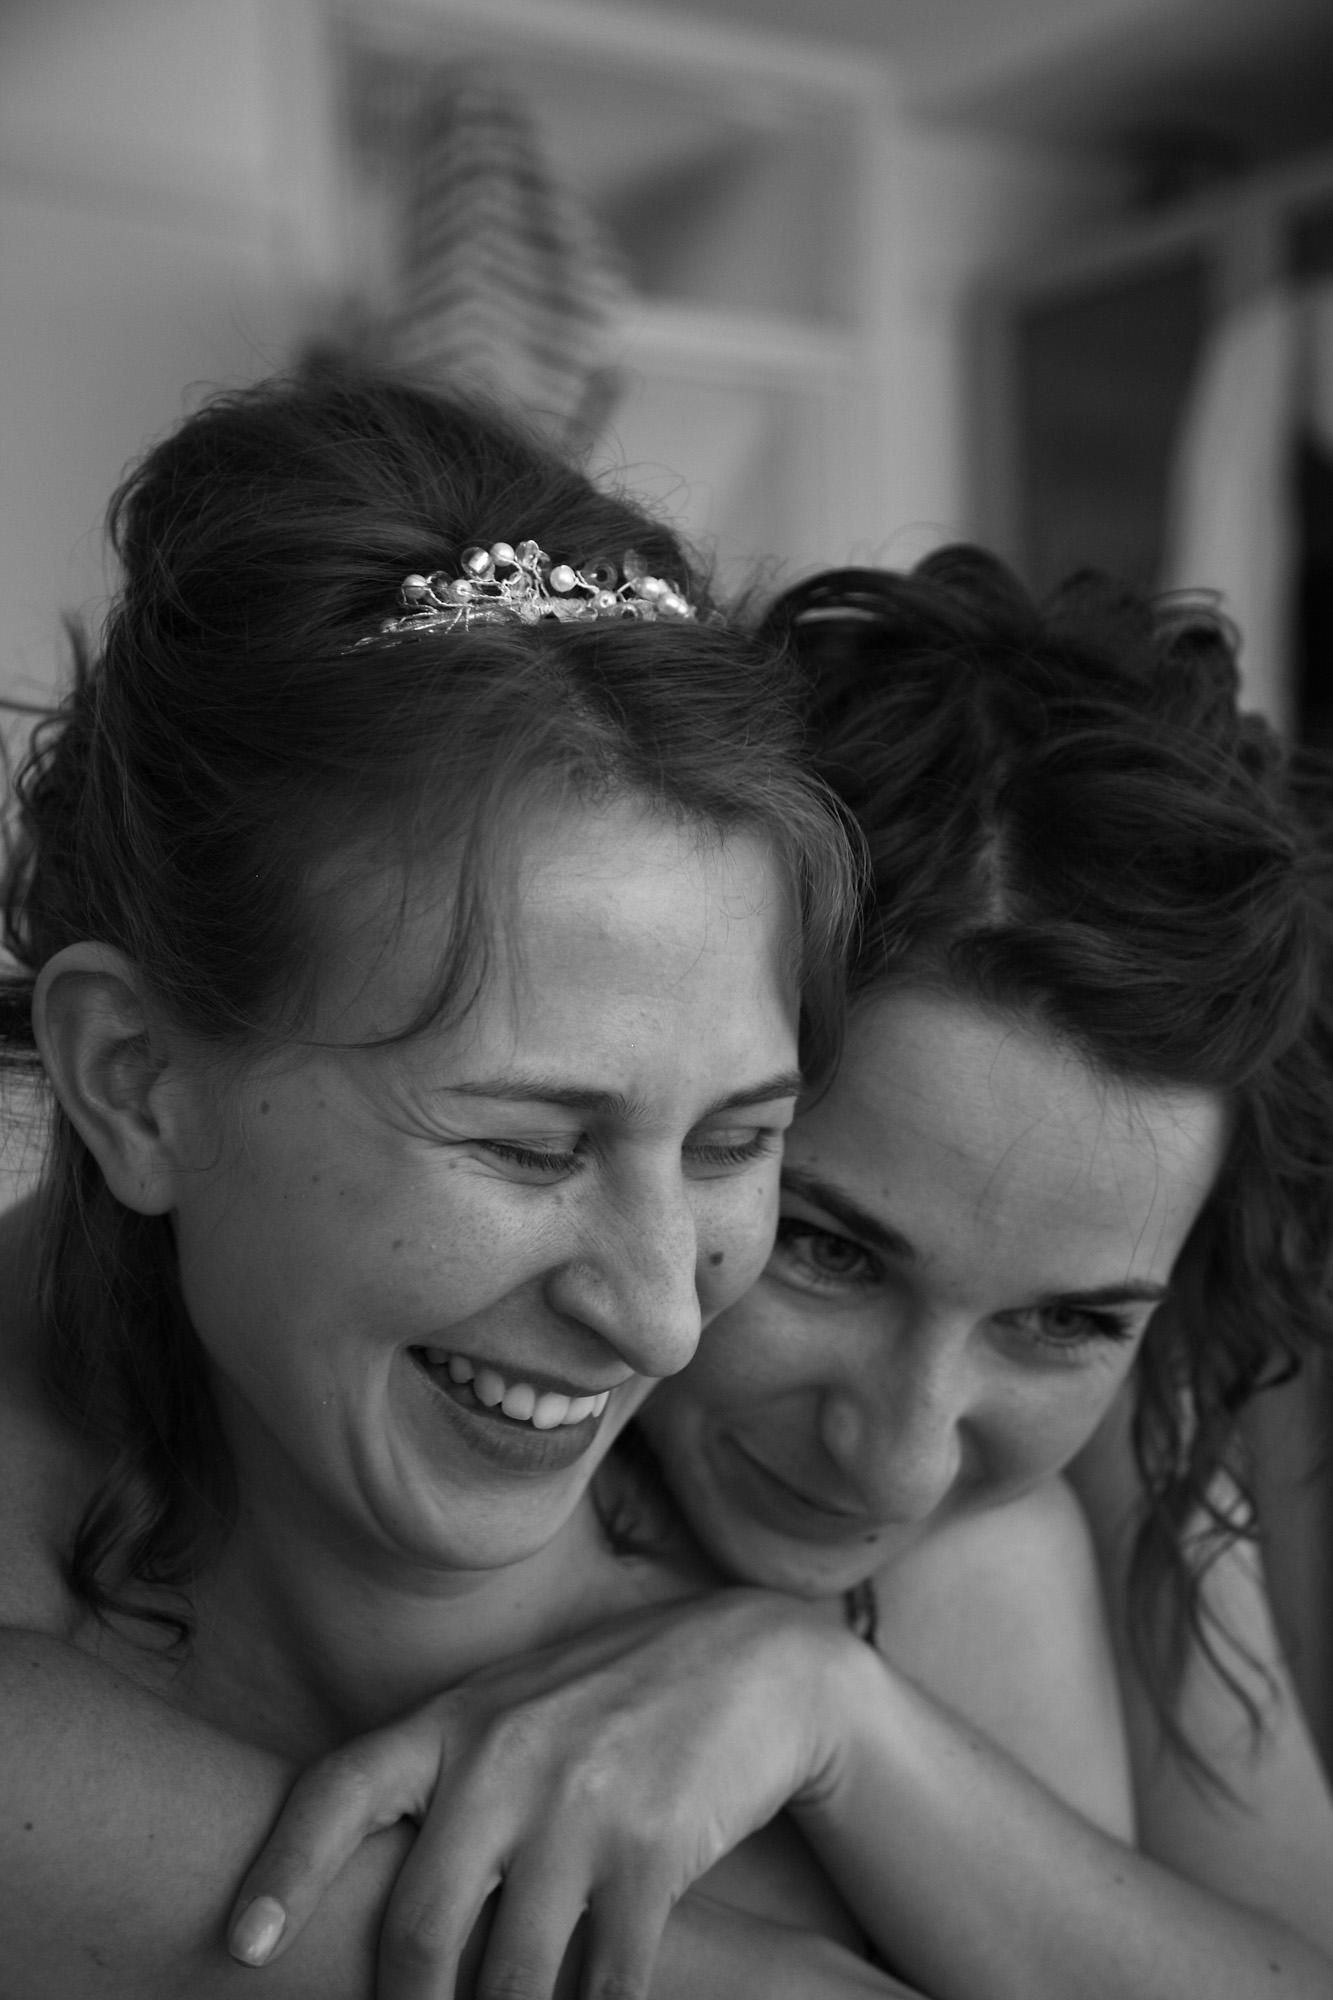 weddings-couples-love-photographer-oxford-london-jonathan-self-photography-7.jpg